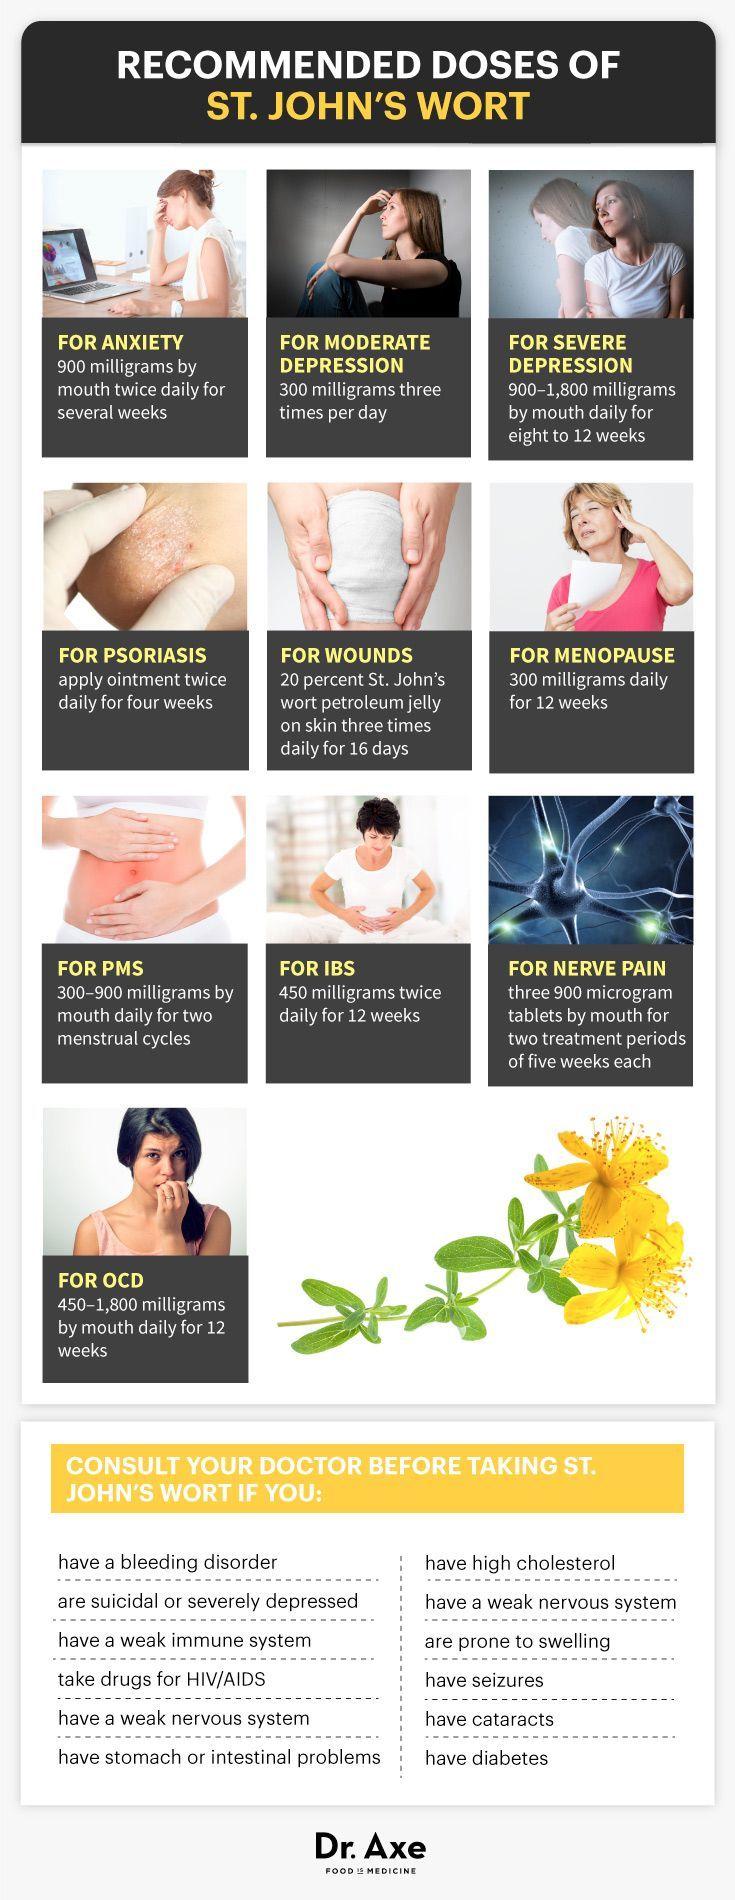 St. John's wort uses - Dr. Axe http://www.draxe.com #health #holistic #natural